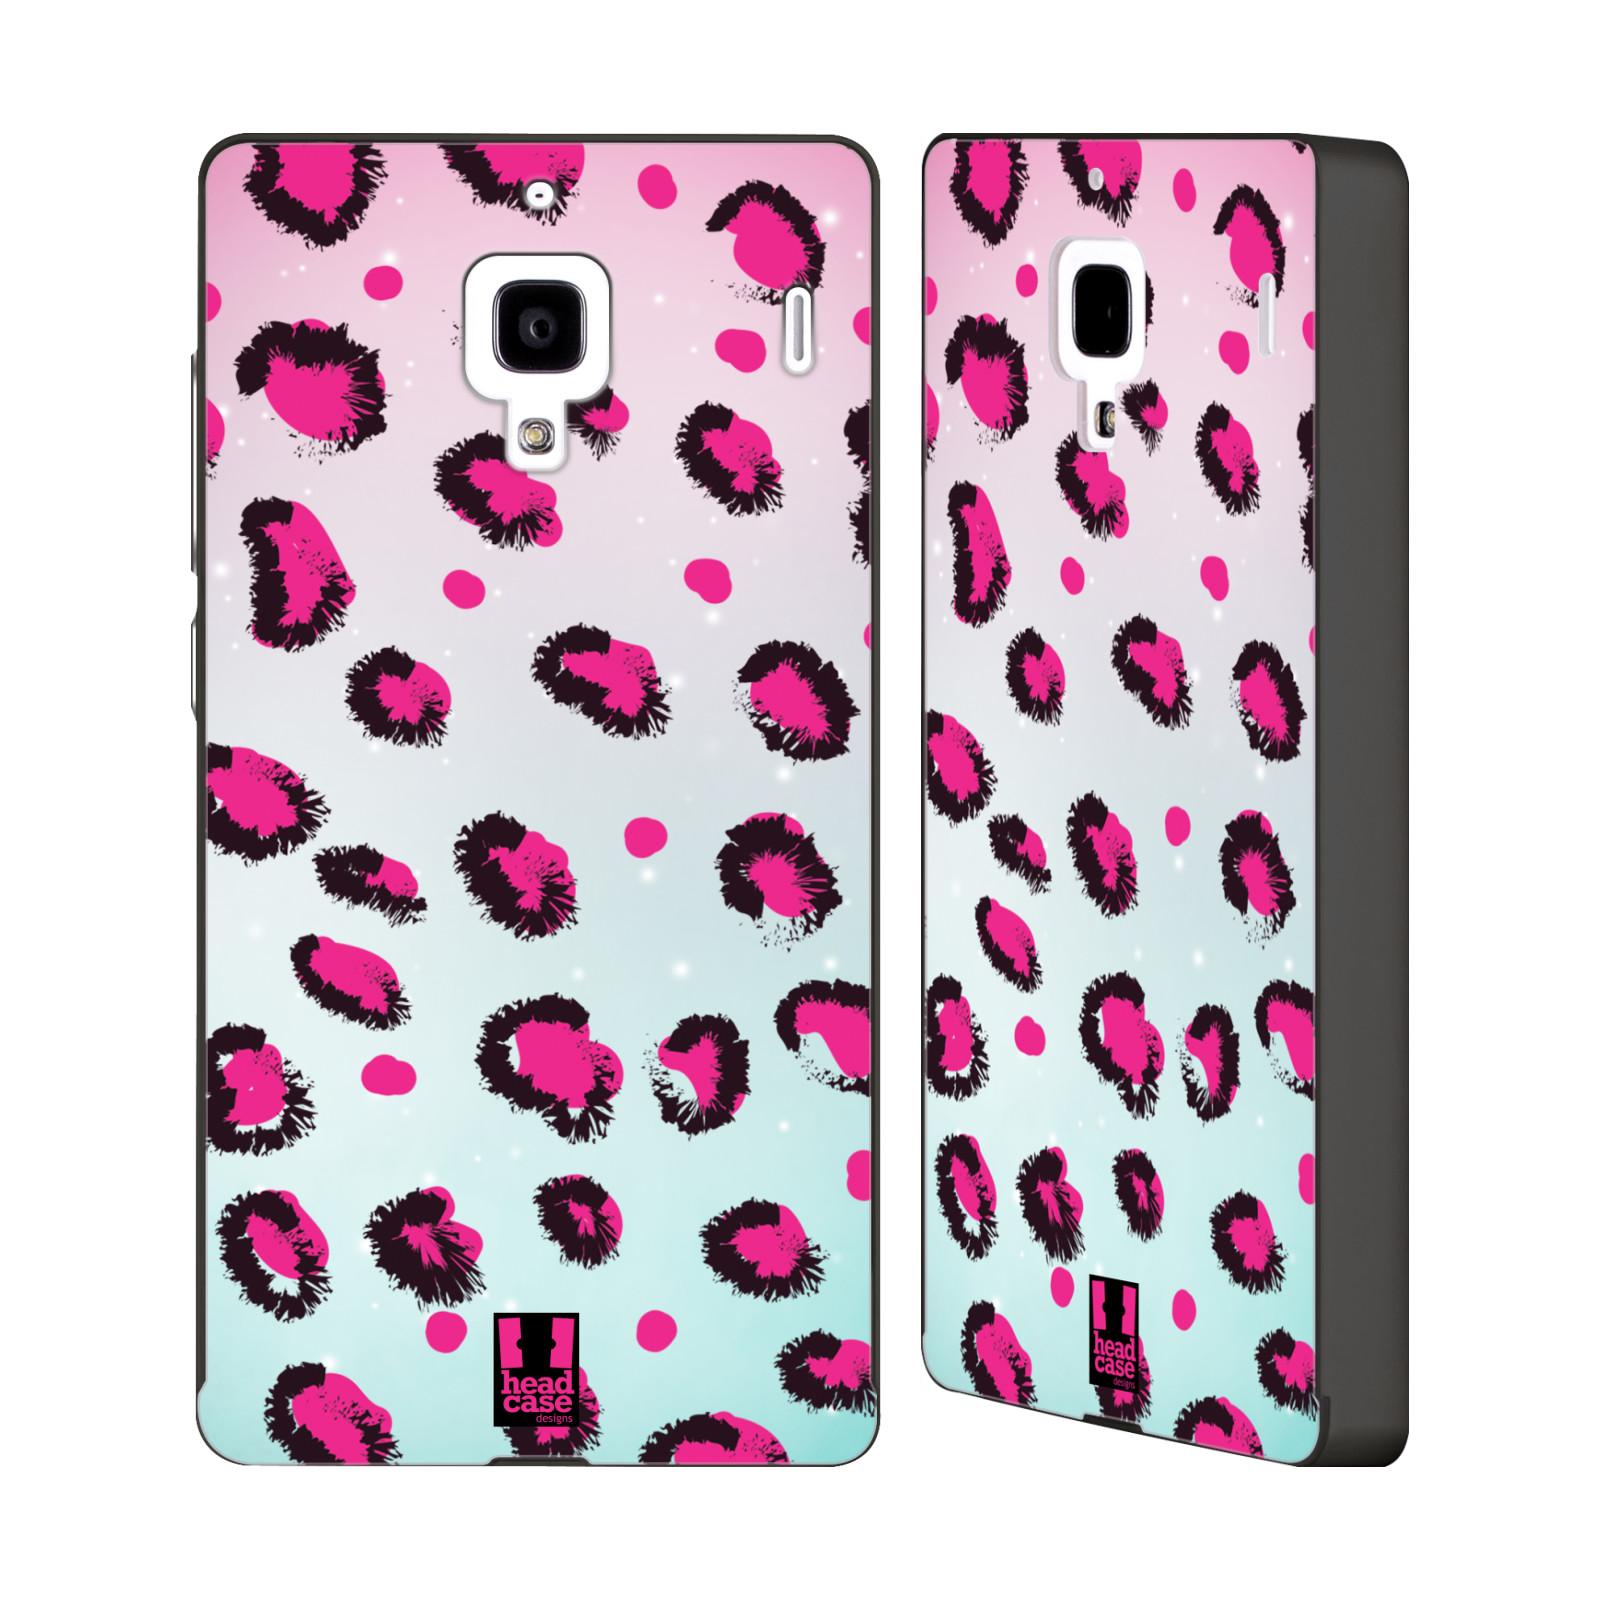 HEAD-CASE-DESIGNS-FAD-ANIMAL-PRINTS-BLACK-SLIDER-CASE-FOR-HUAWEI-XIAOMI-PHONES